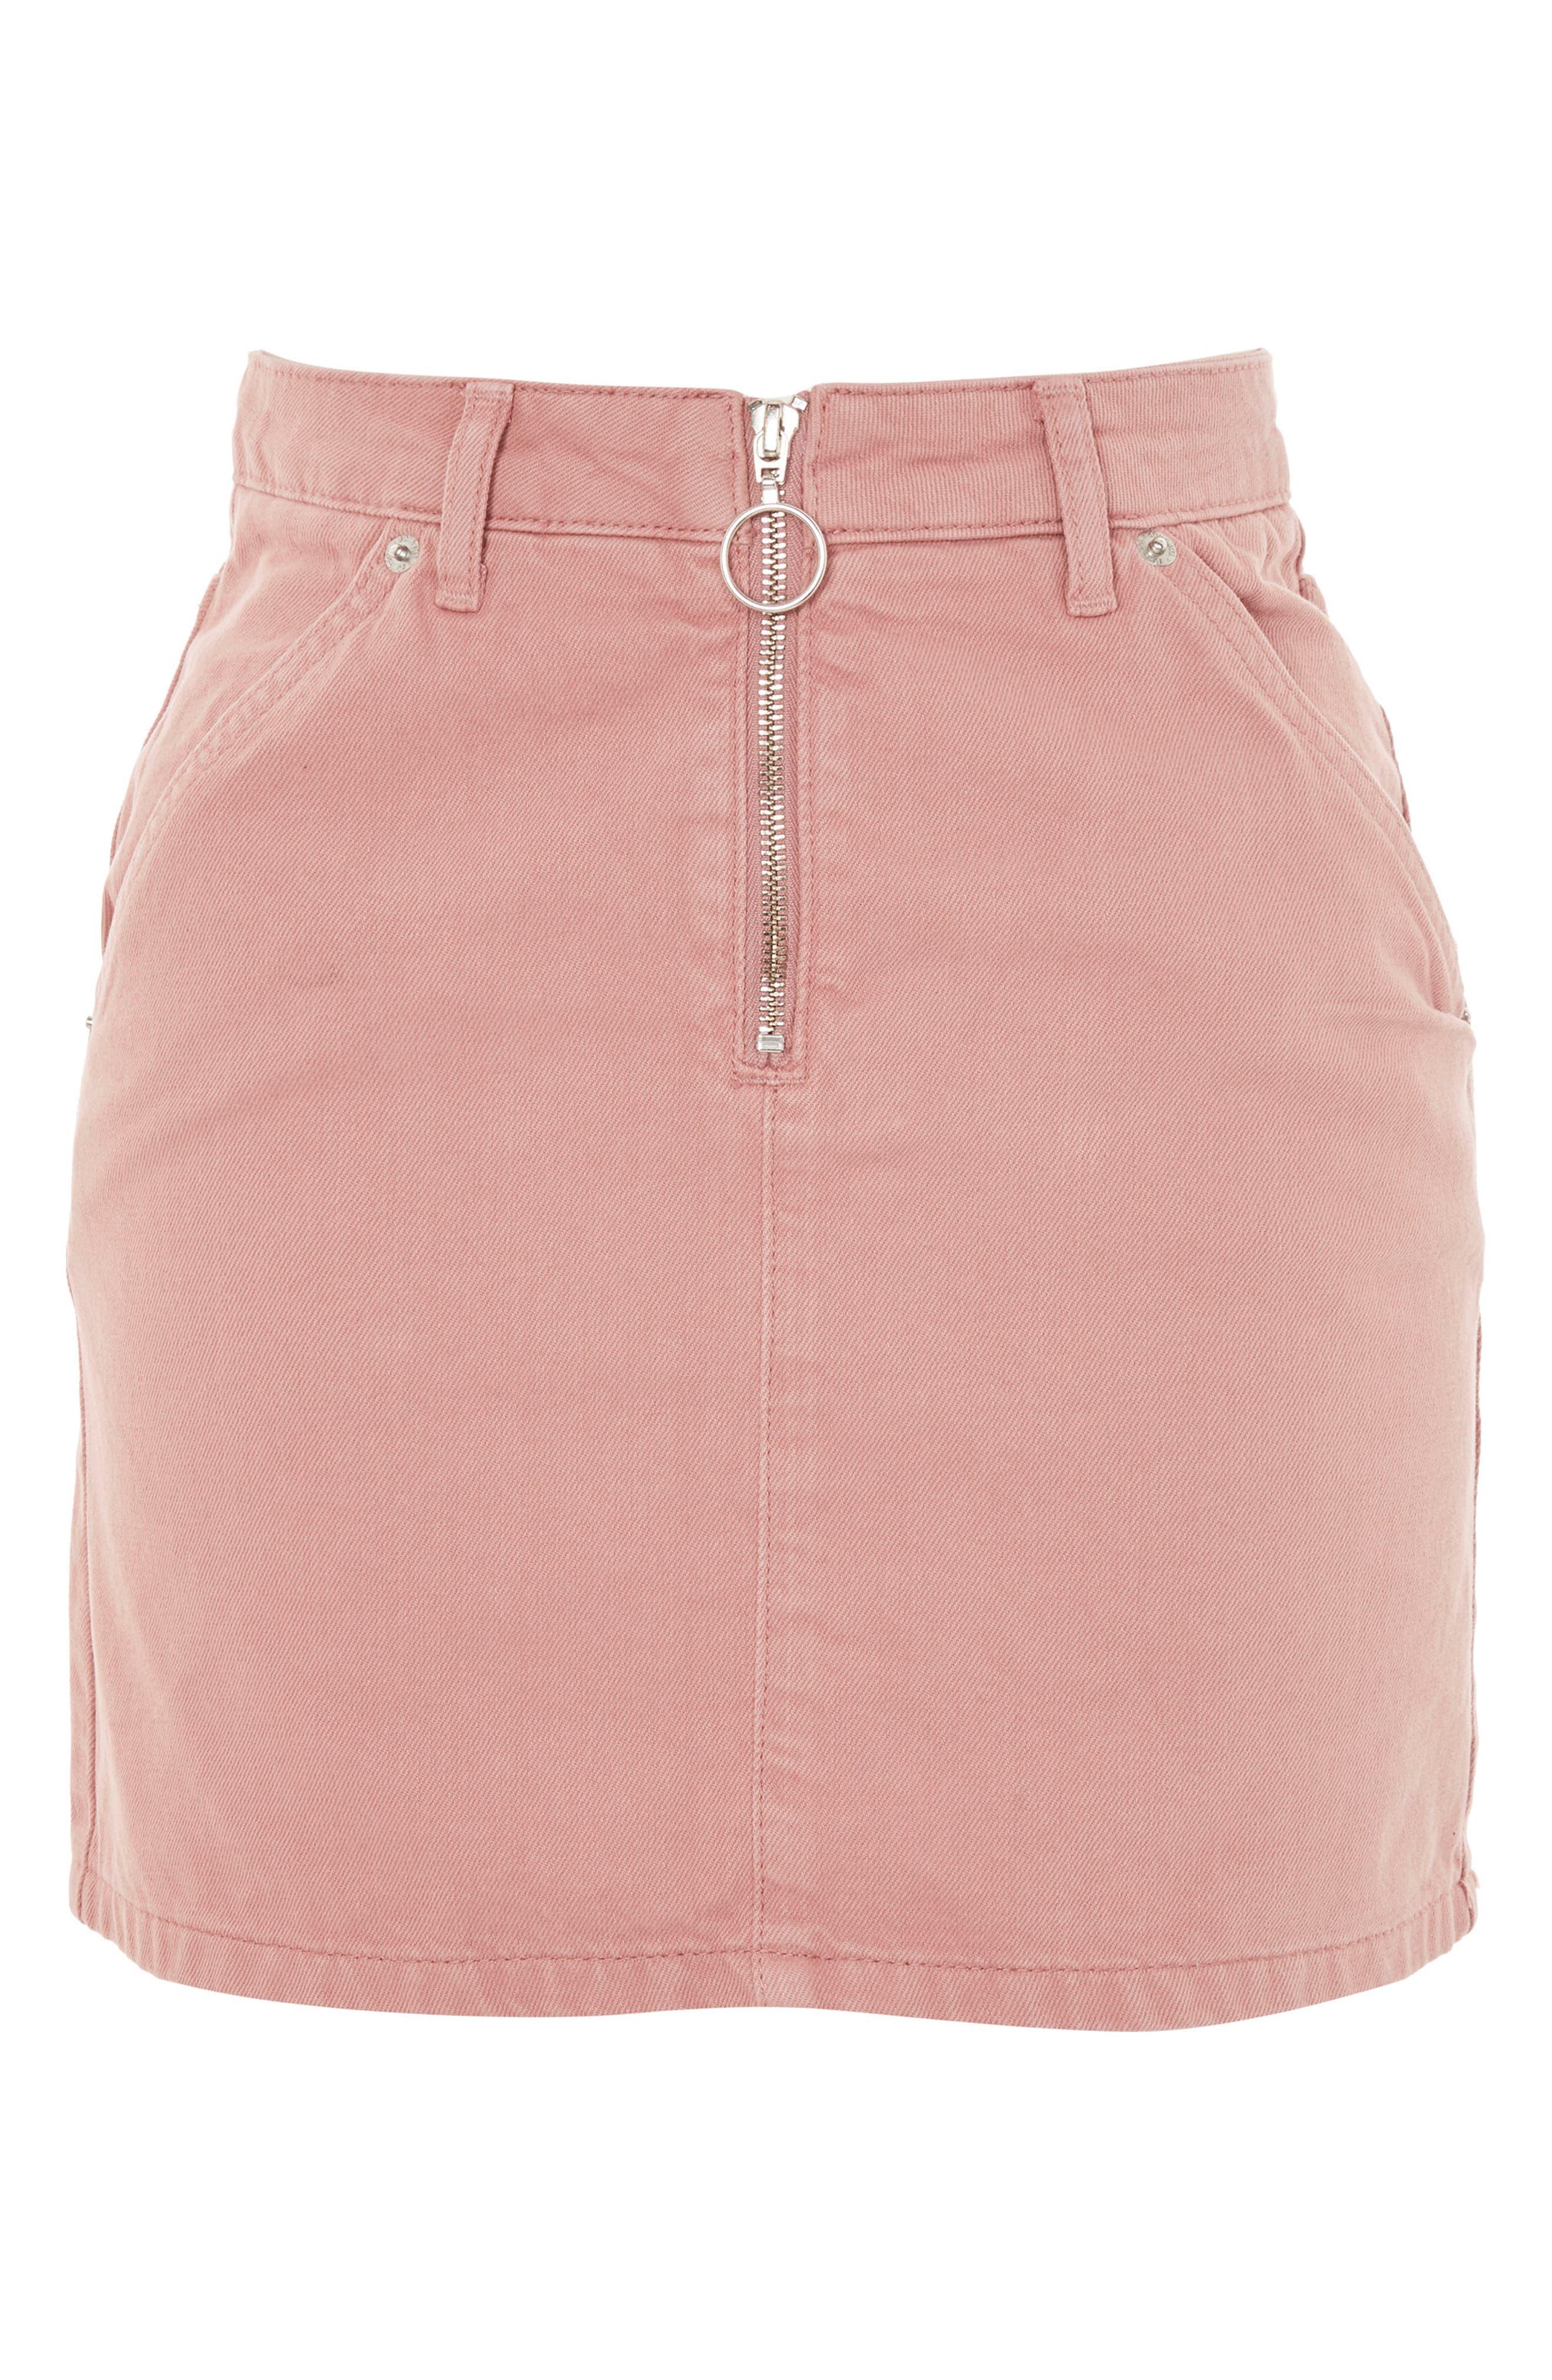 Half Zip Denim Skirt,                             Alternate thumbnail 4, color,                             Rose